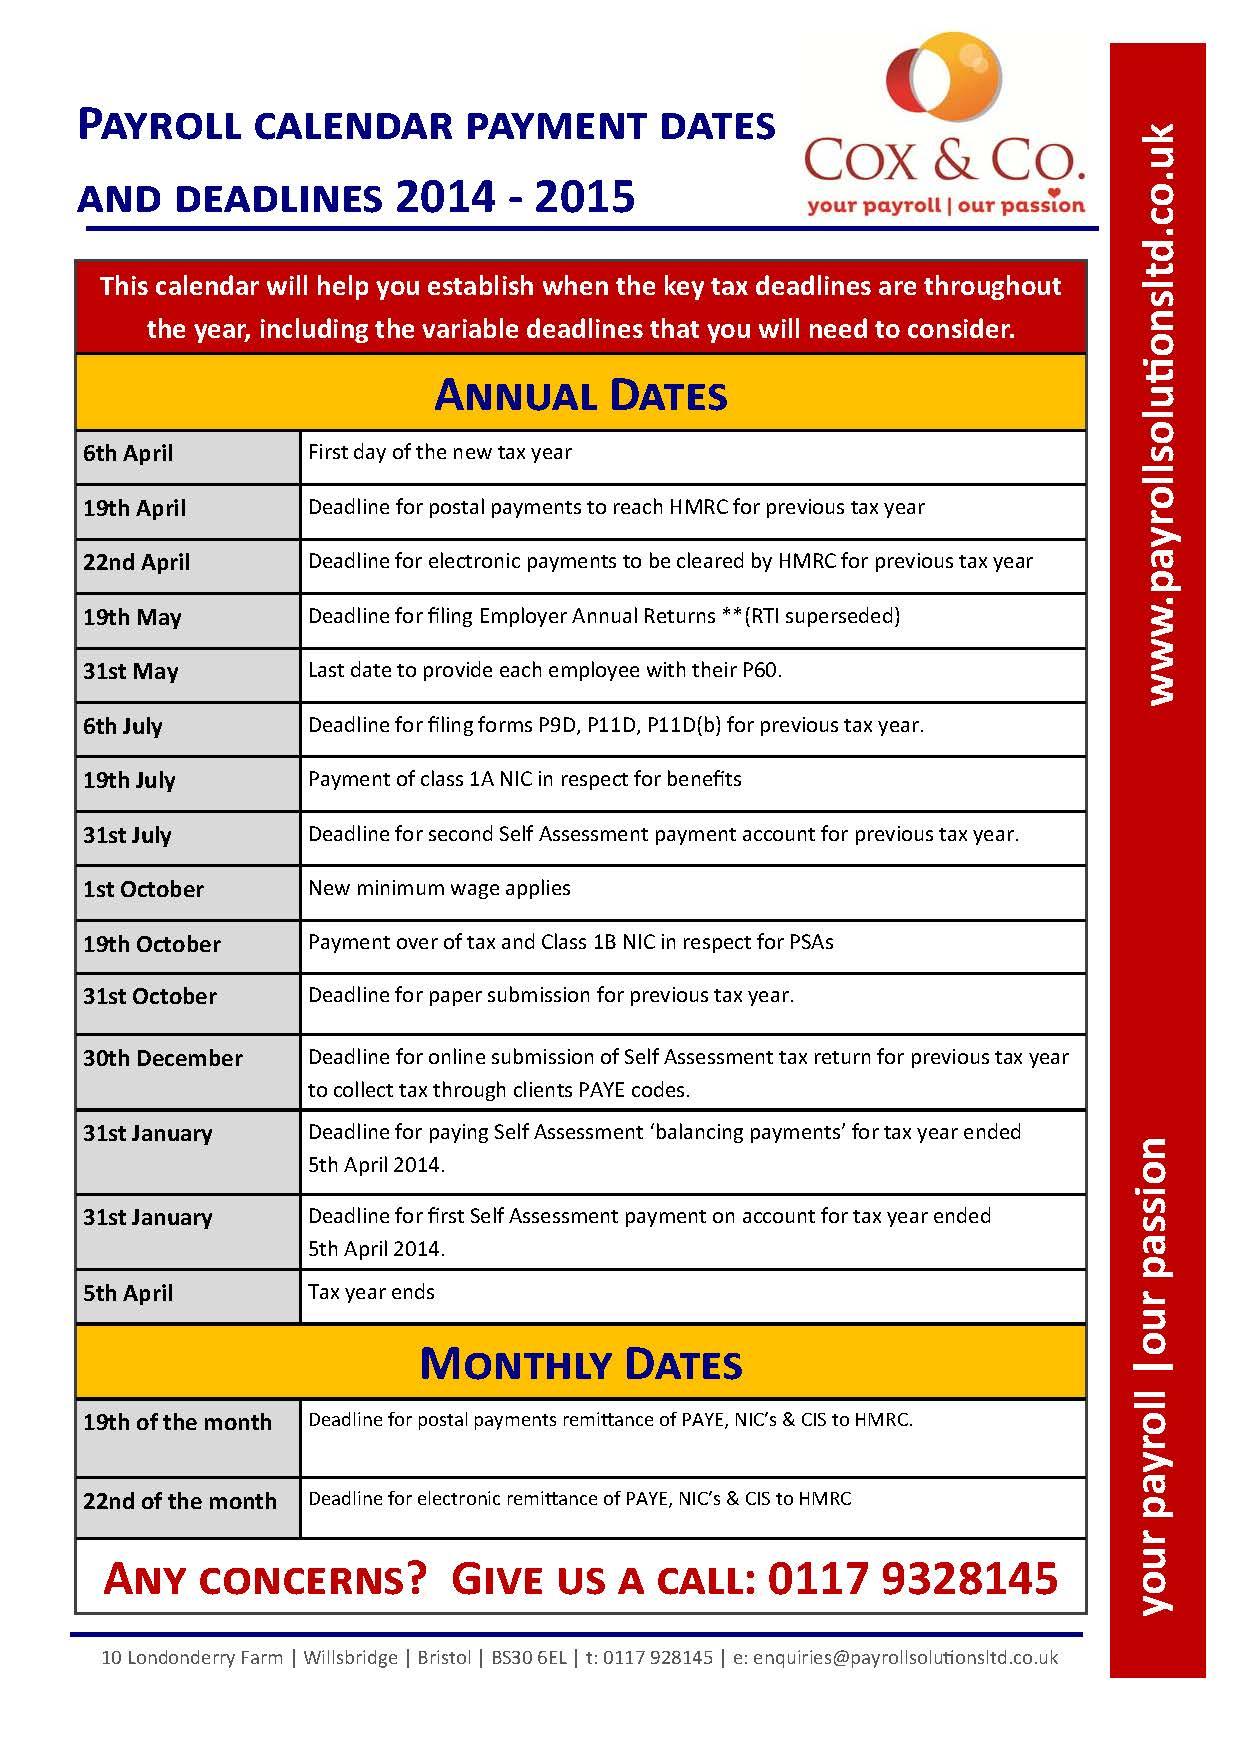 Payroll Calendar 2014 - 2015: HMRC Dates and Tax Deadlines |